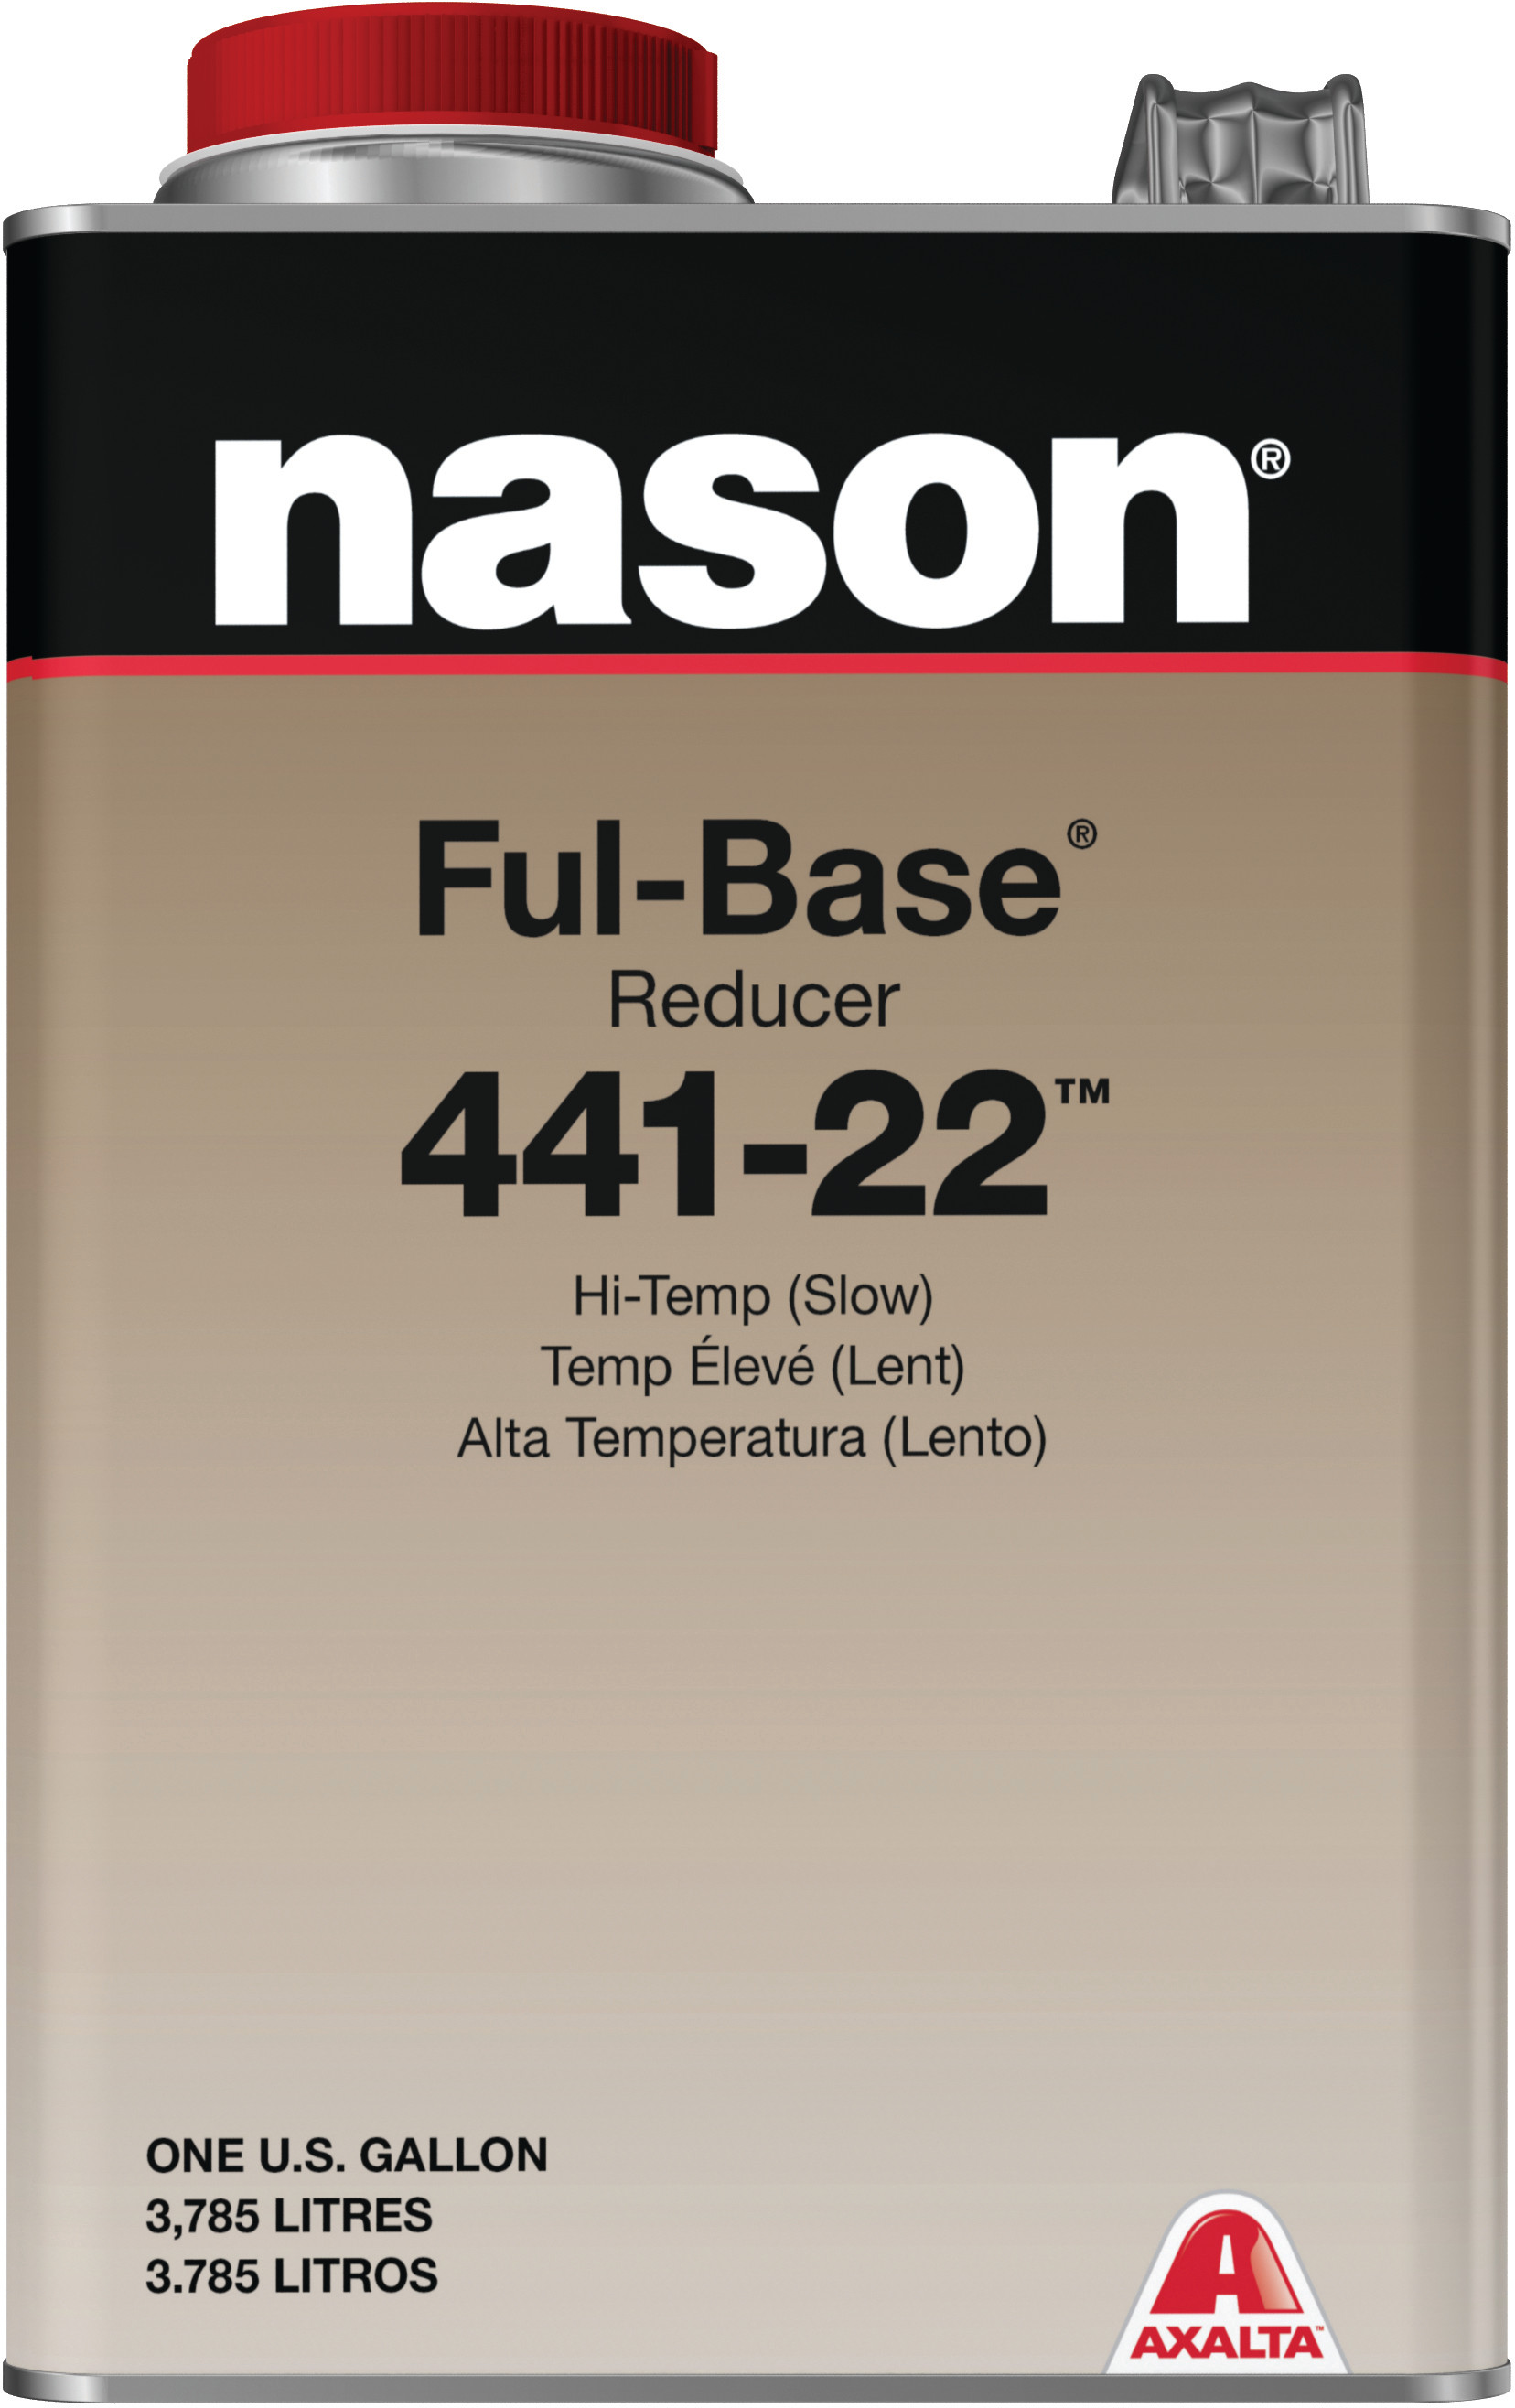 Hose Spray Nozzle >> Axalta Nason Ful-Base Reducer 441-22 Slow Gallon